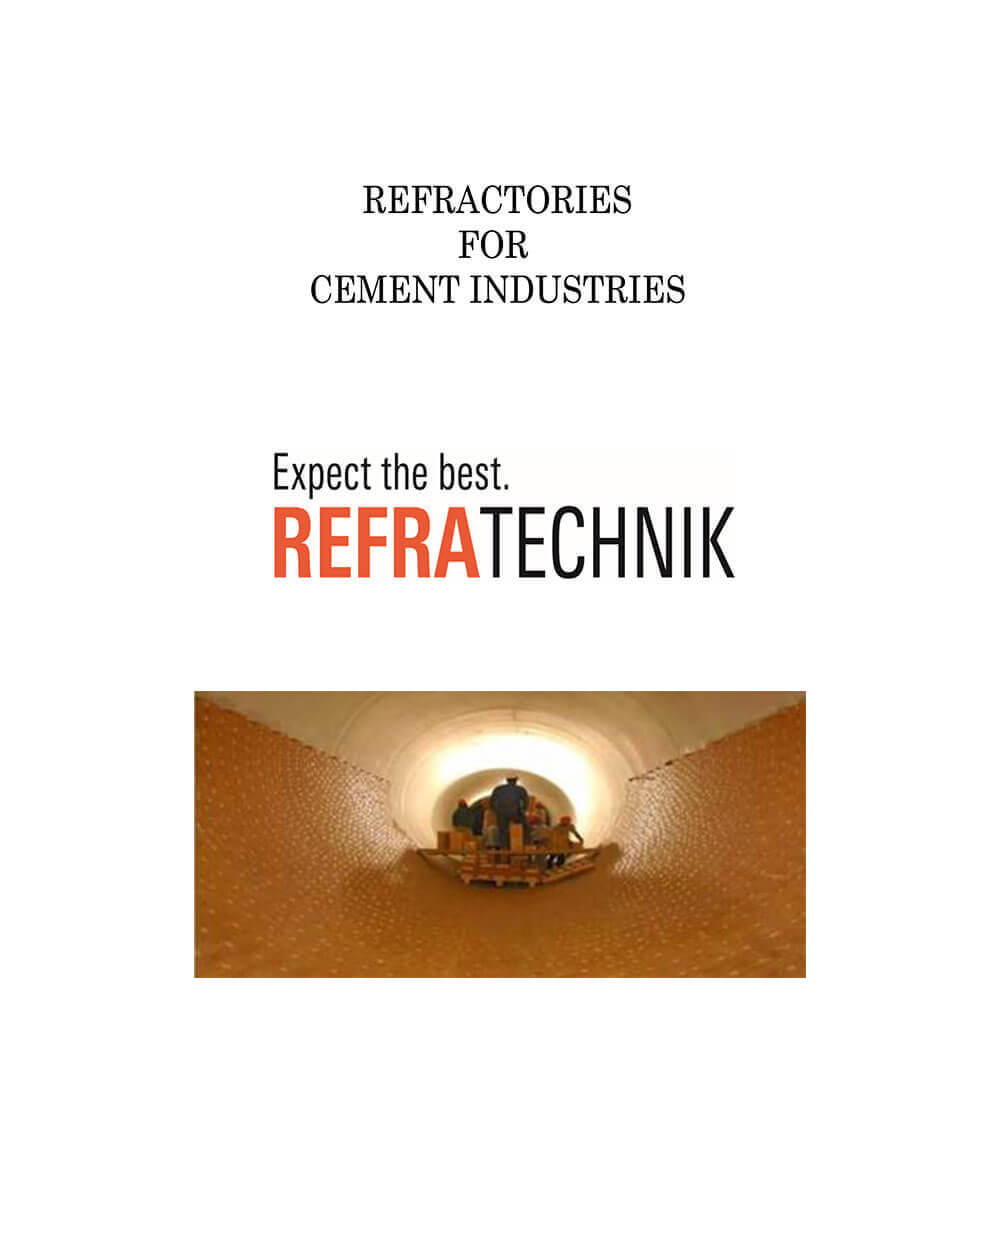 Refractories for Cement Industries